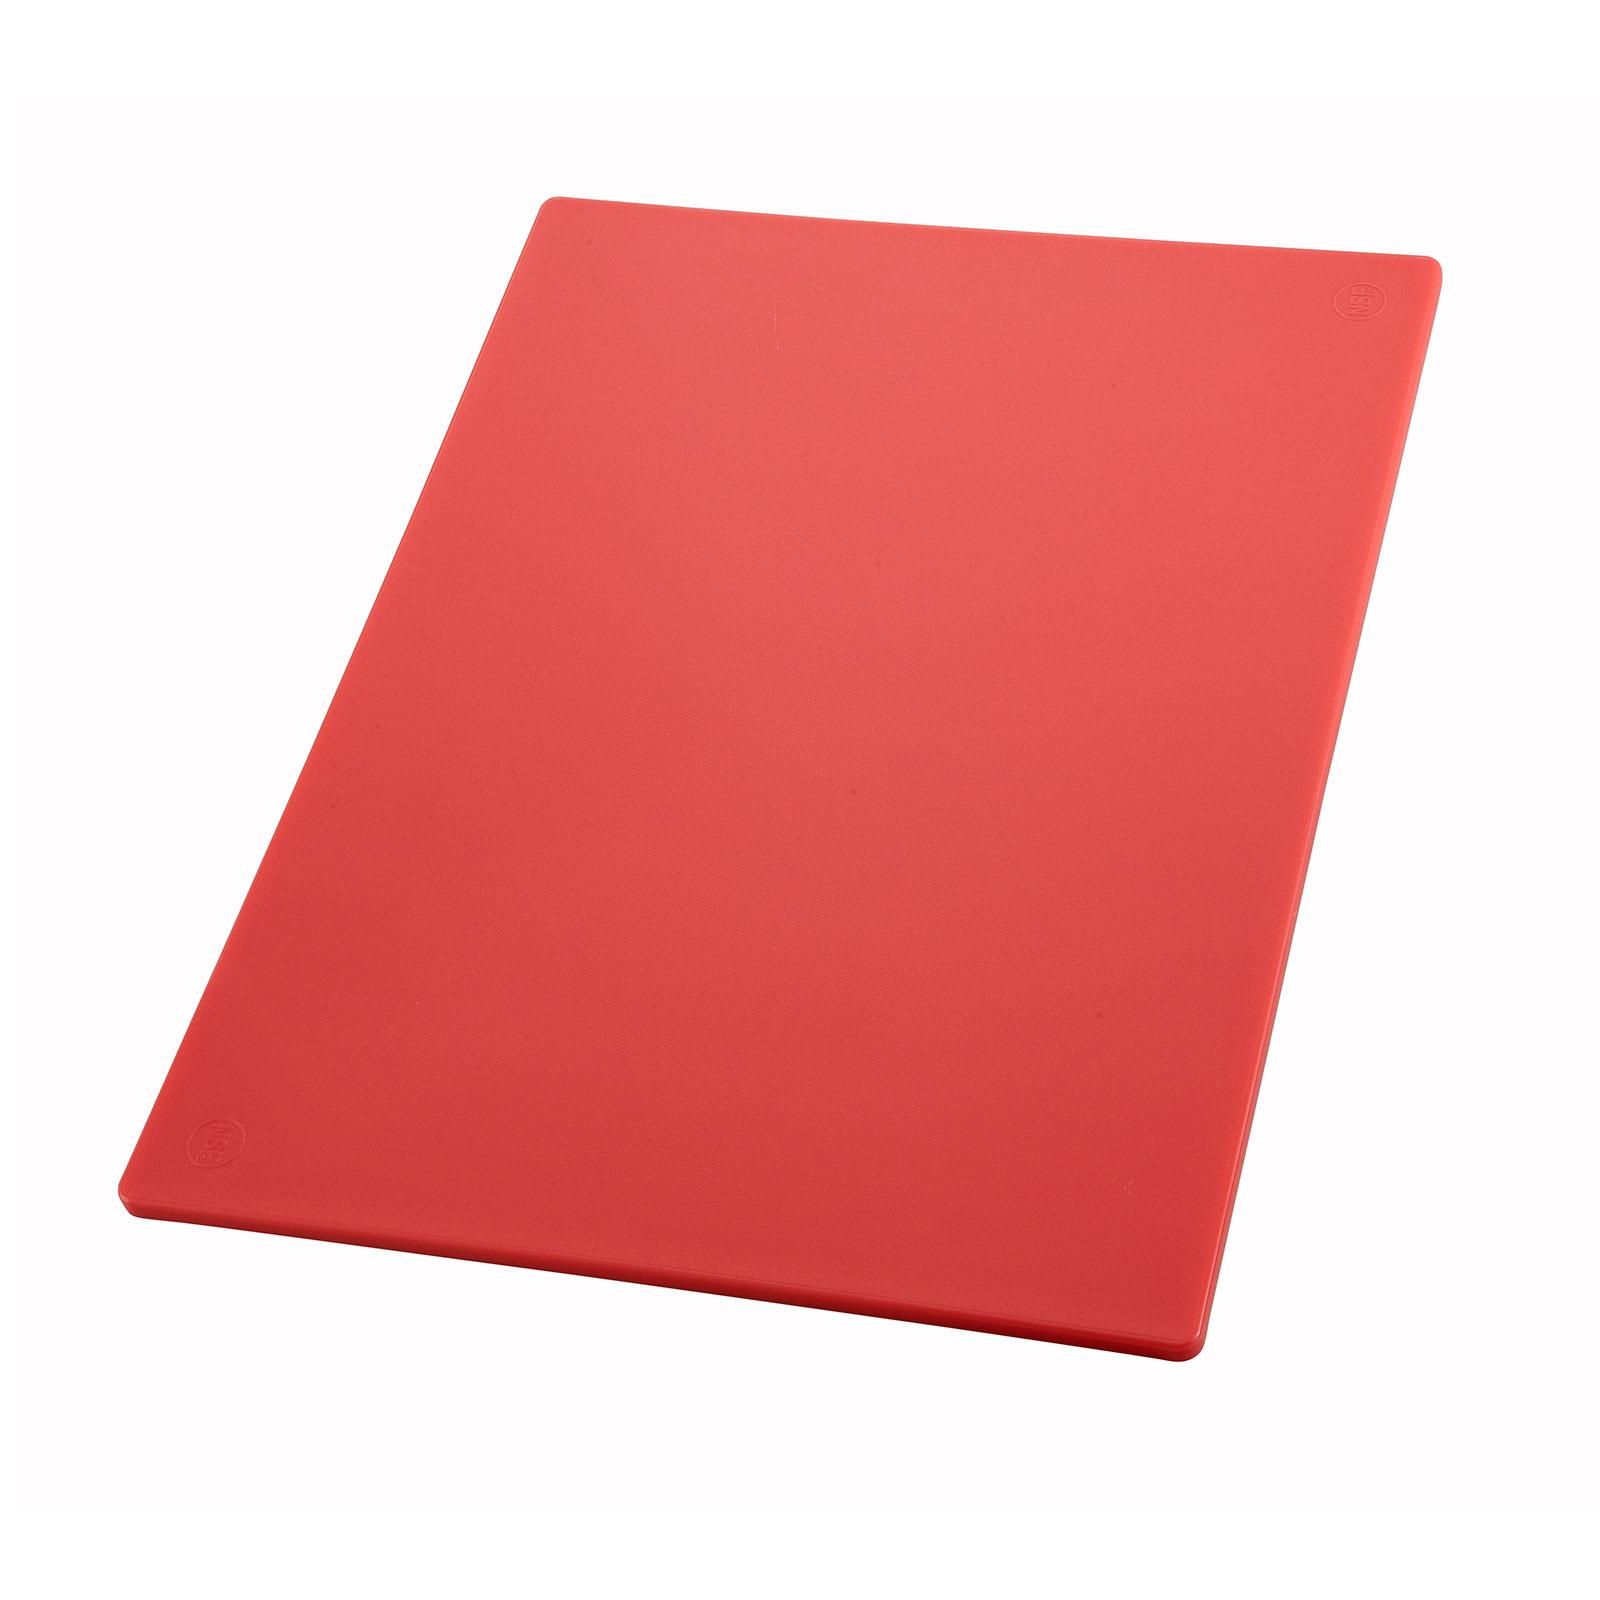 "15"" x 20"" Red Cutting Board, Winco CBRD-1520"